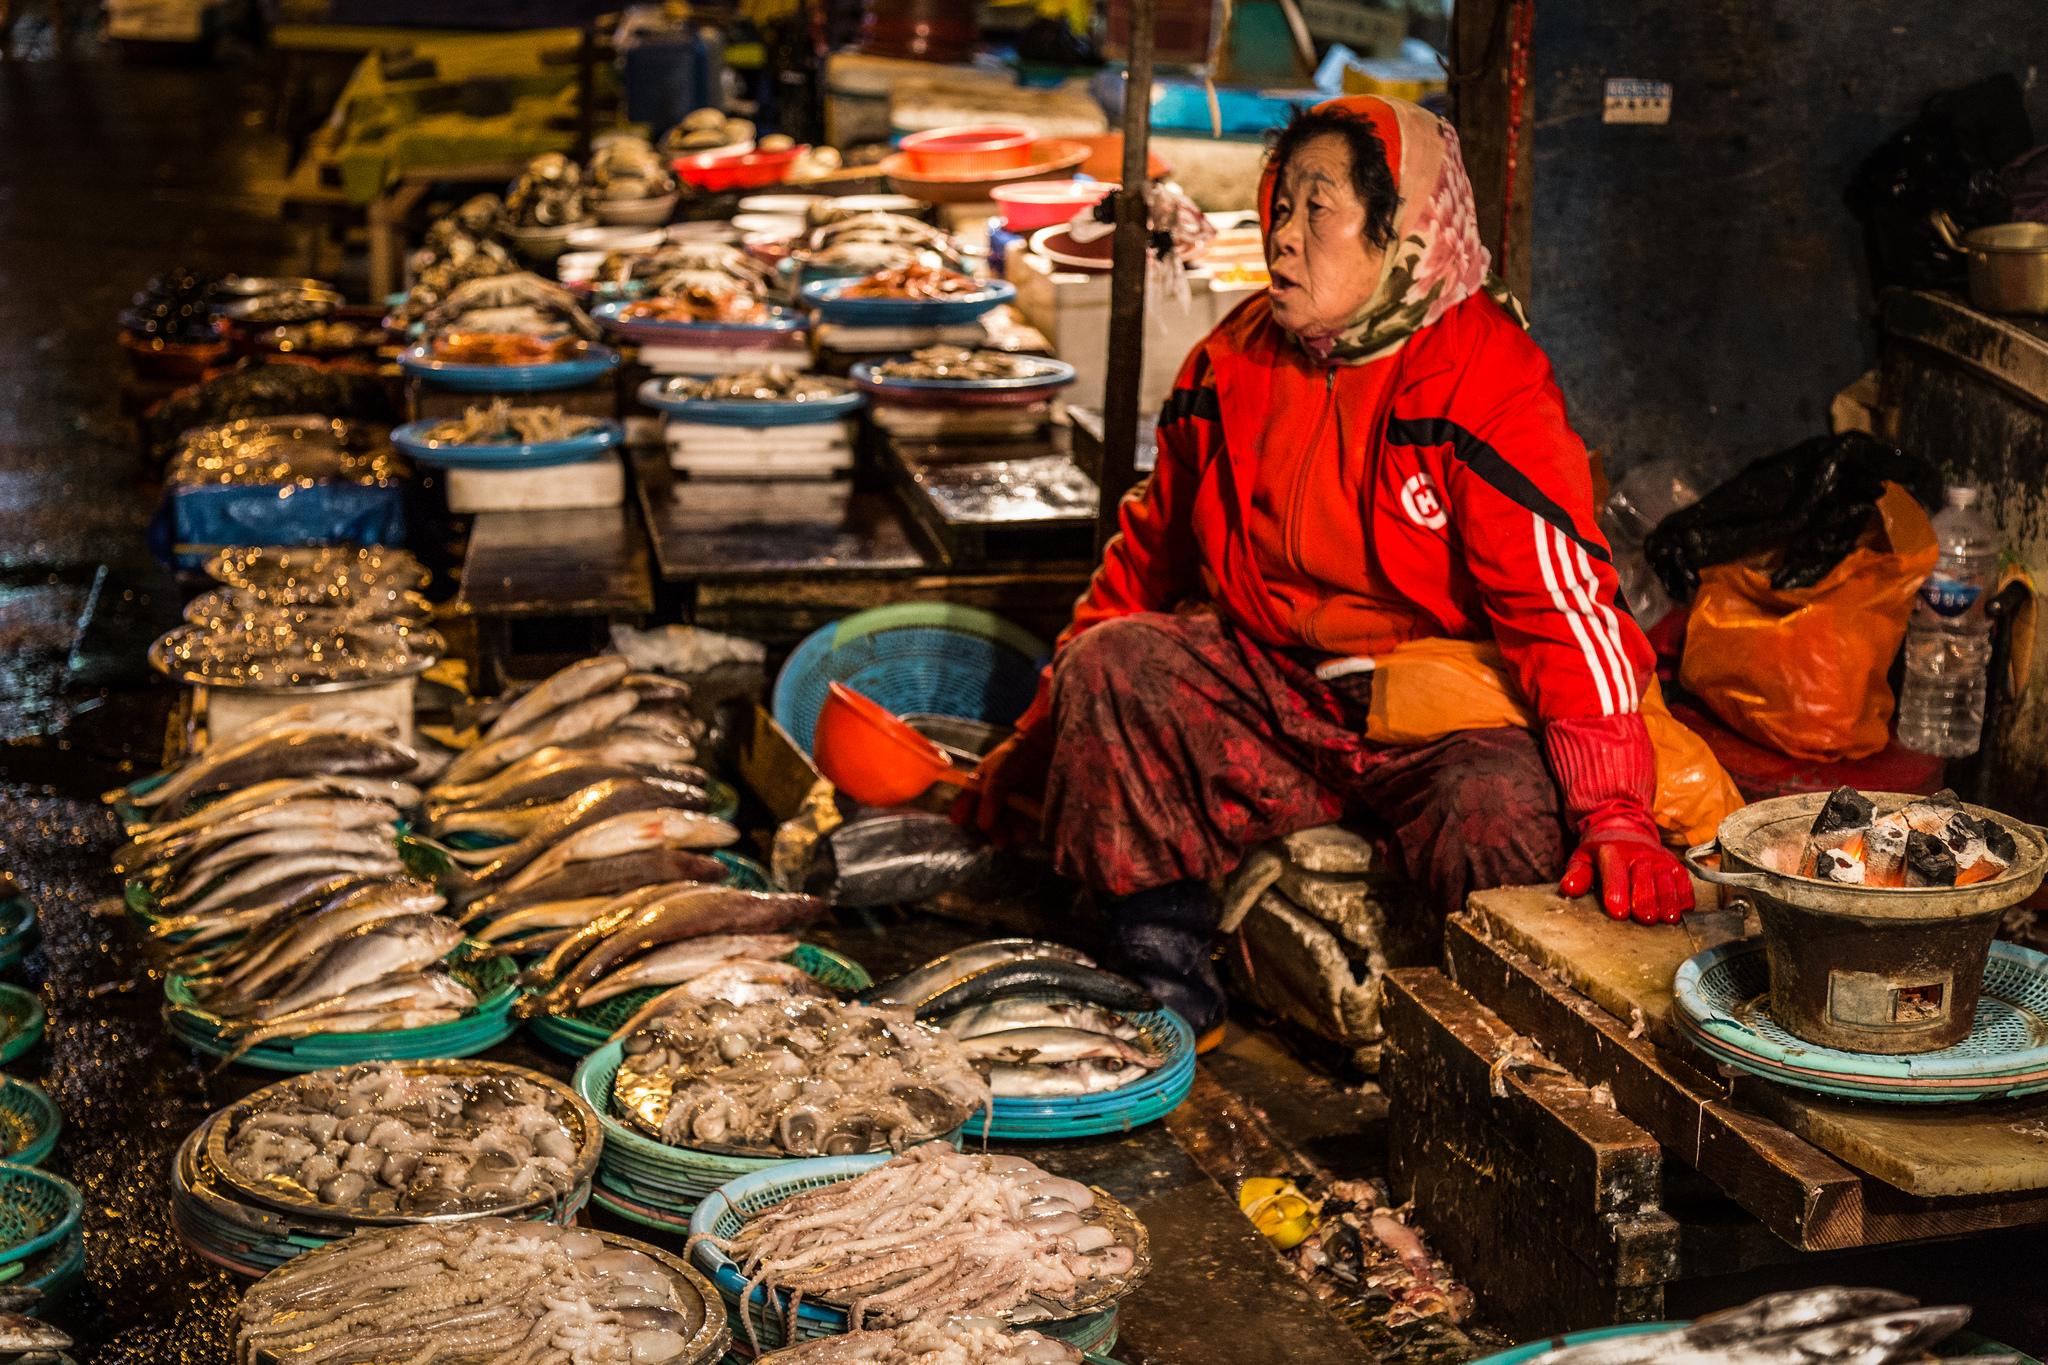 Old Woman at Jagalchi Fish Market  © Ryan Bodenstein/Flickr